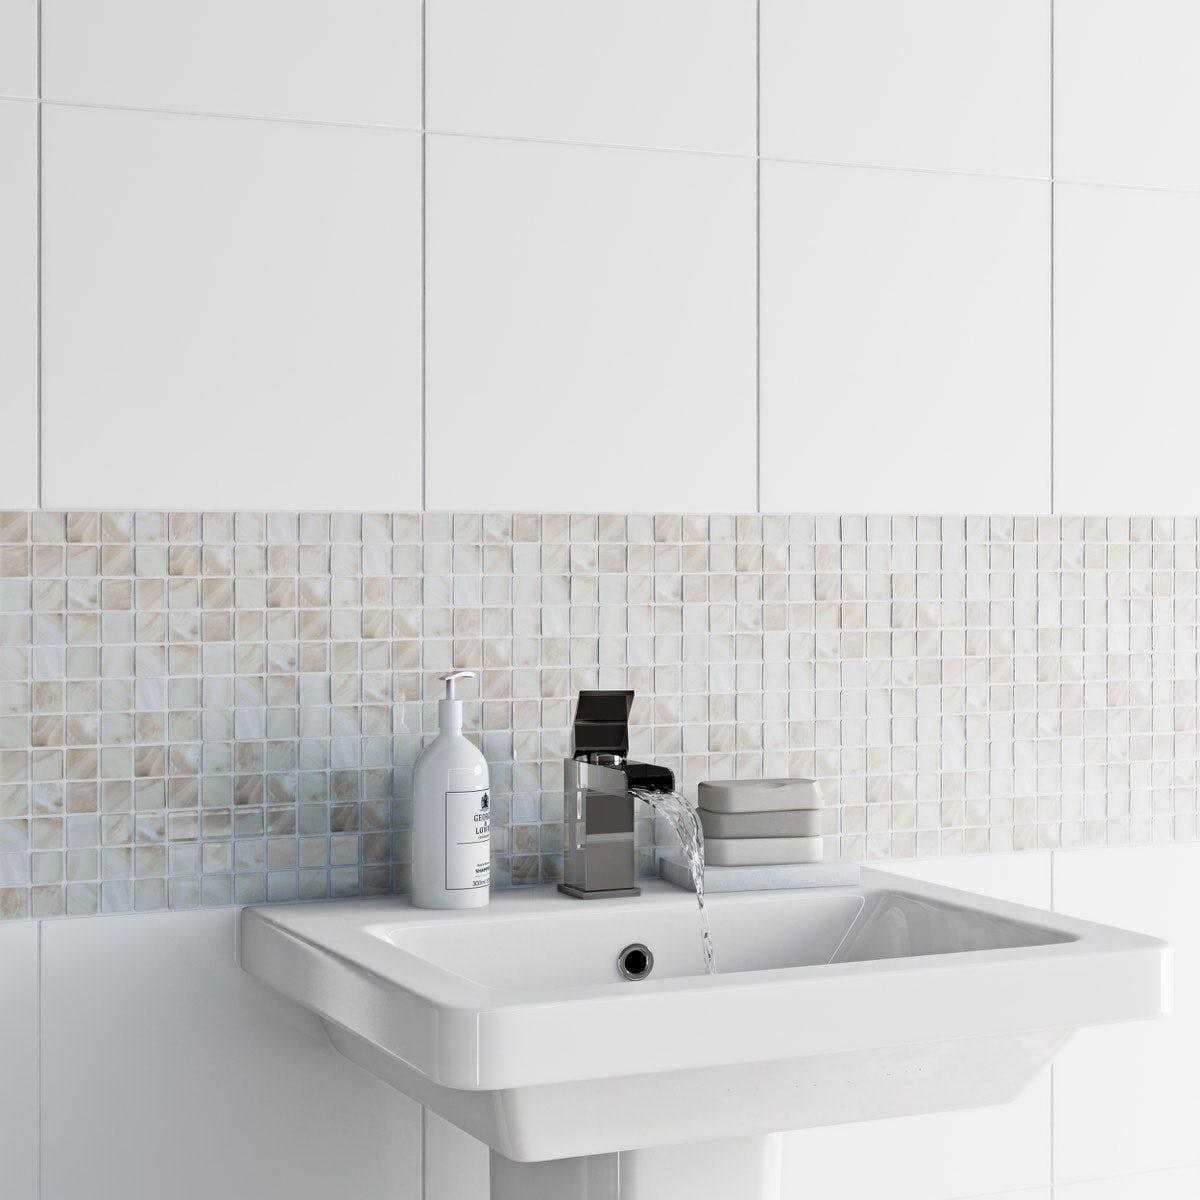 British Ceramic Tile Mosaic pearl tile 300mm x 300mm - 1 sheet ...